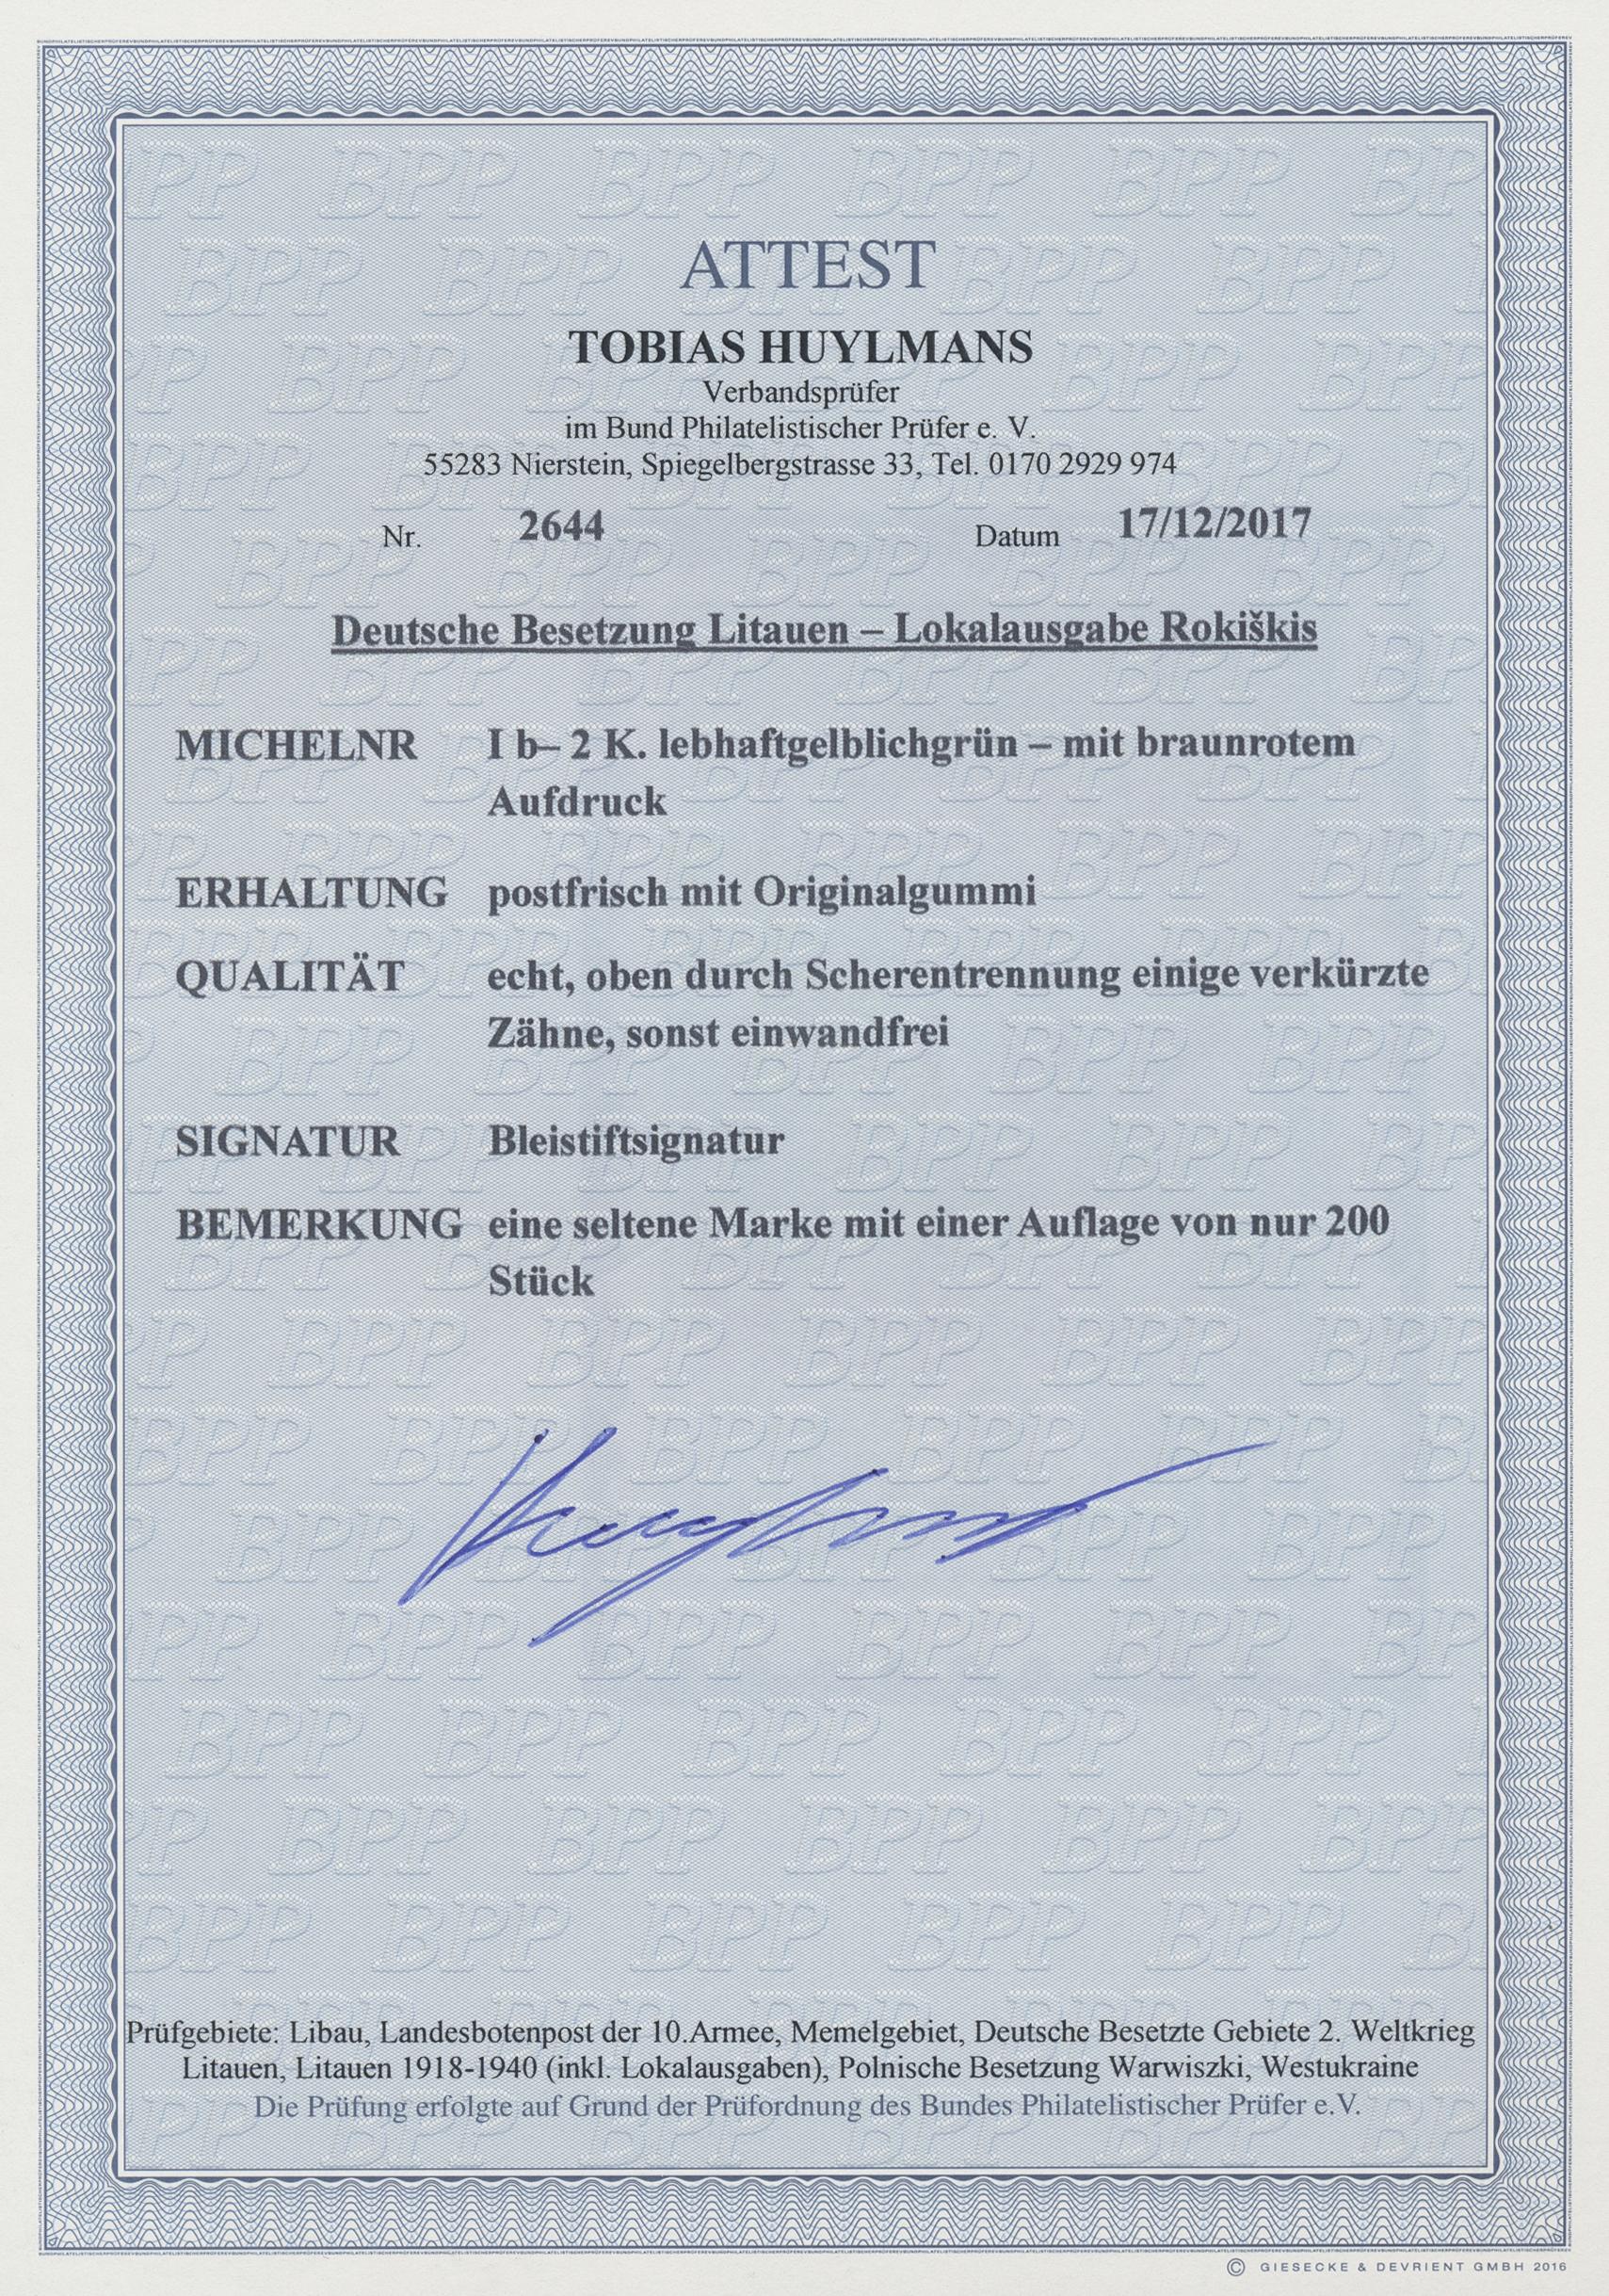 Lot 19462 - Dt. Besetzung II WK - Litauen - Rakischki (Rokiskis)  -  Auktionshaus Christoph Gärtner GmbH & Co. KG Auction #40 Germany, Picture Post Cards, Collections Overseas, Thematics